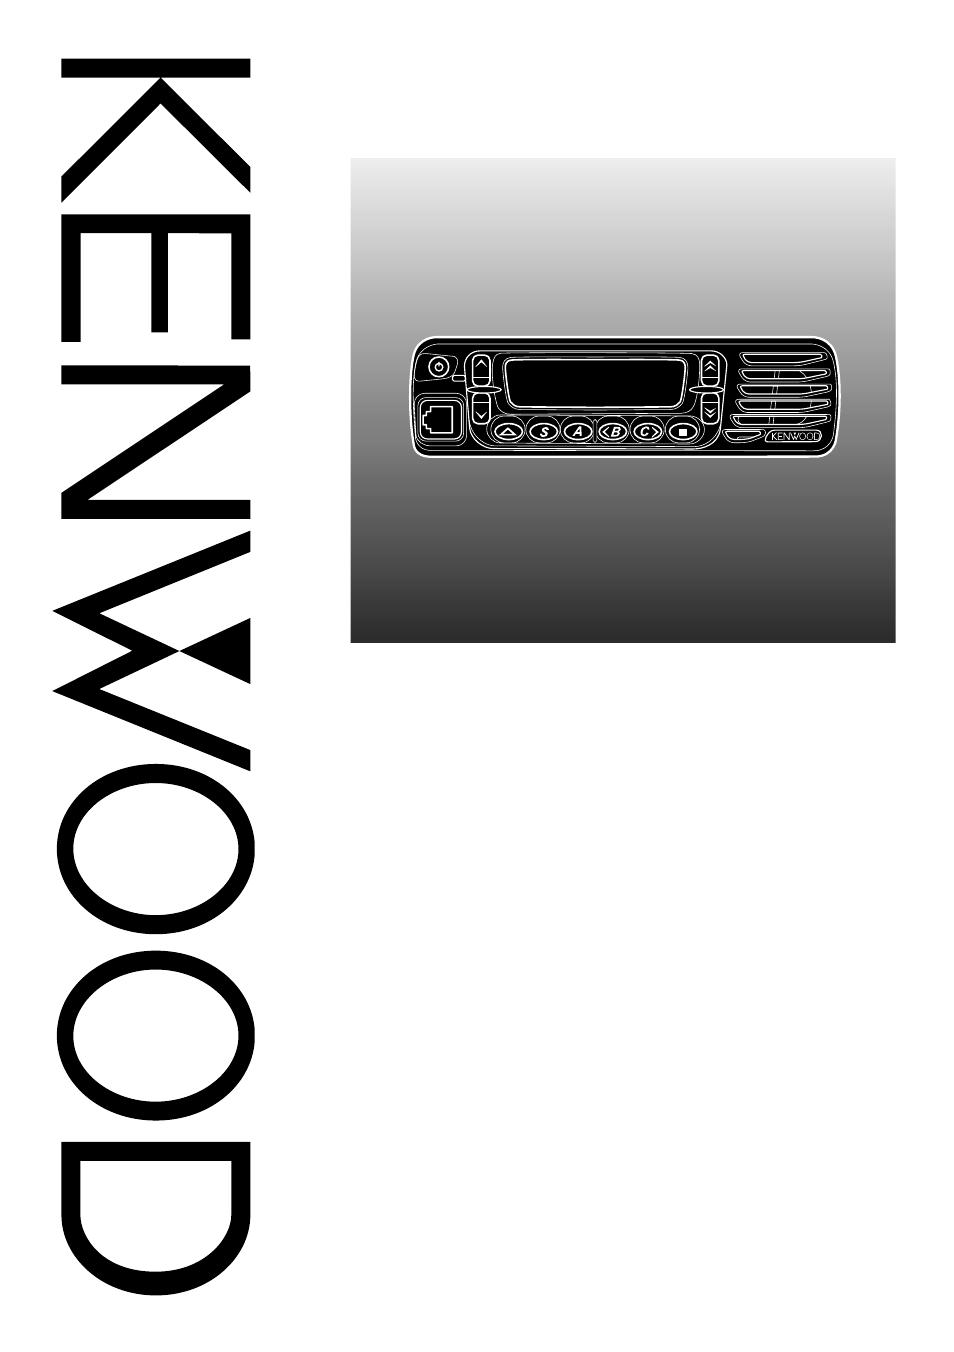 kenwood tk 7180 user manual 33 pages also for tk 8180 tk 7180h rh manualsdir com Kenwood Tk 2180 Radio Kenwood Tk 8180 Radio